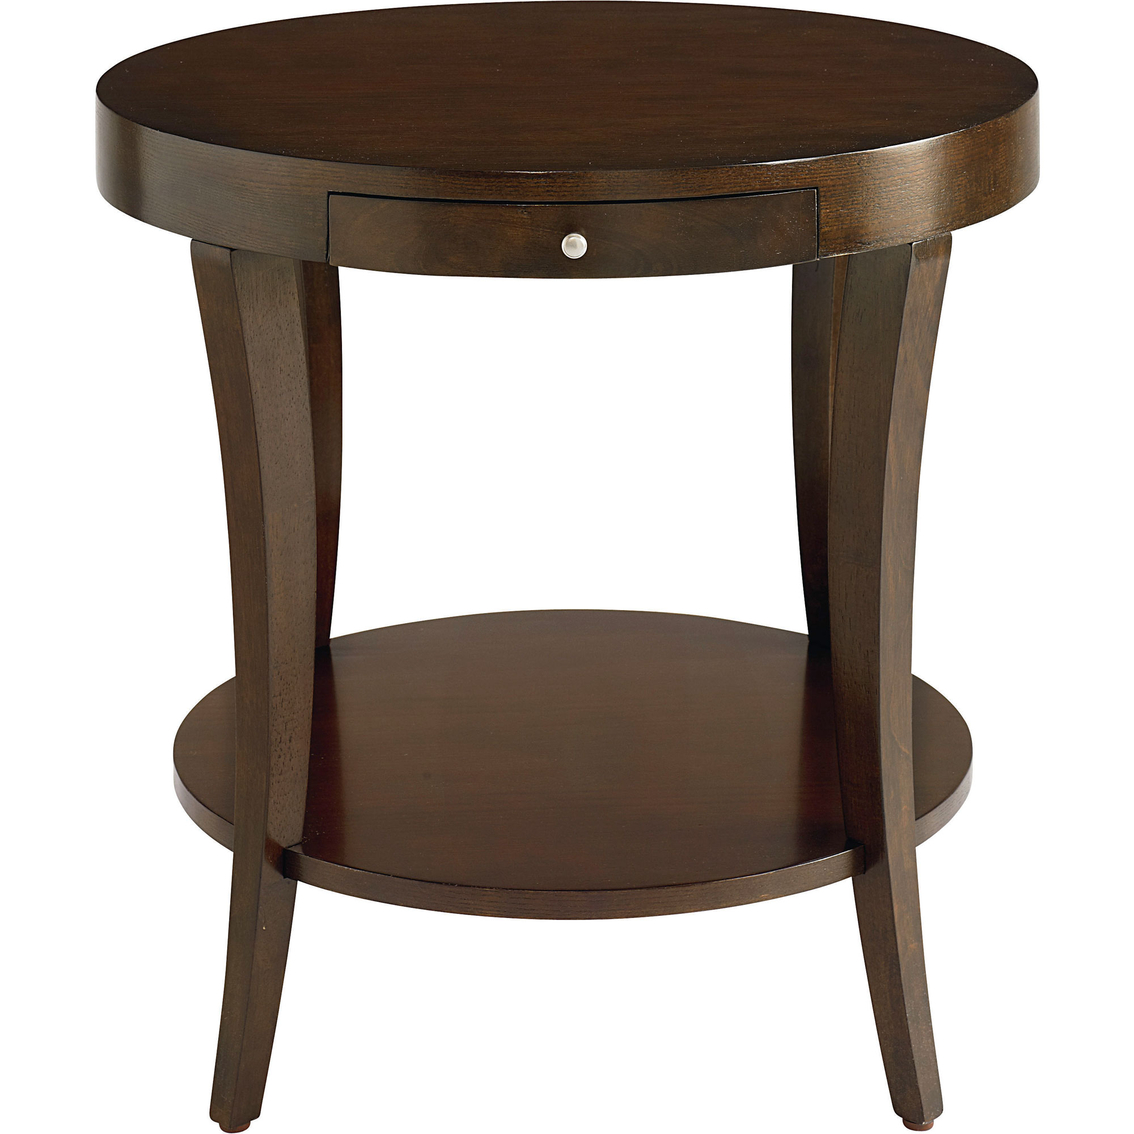 Bassett Presidio Round Lamp Table | Living Room Tables | Home ...